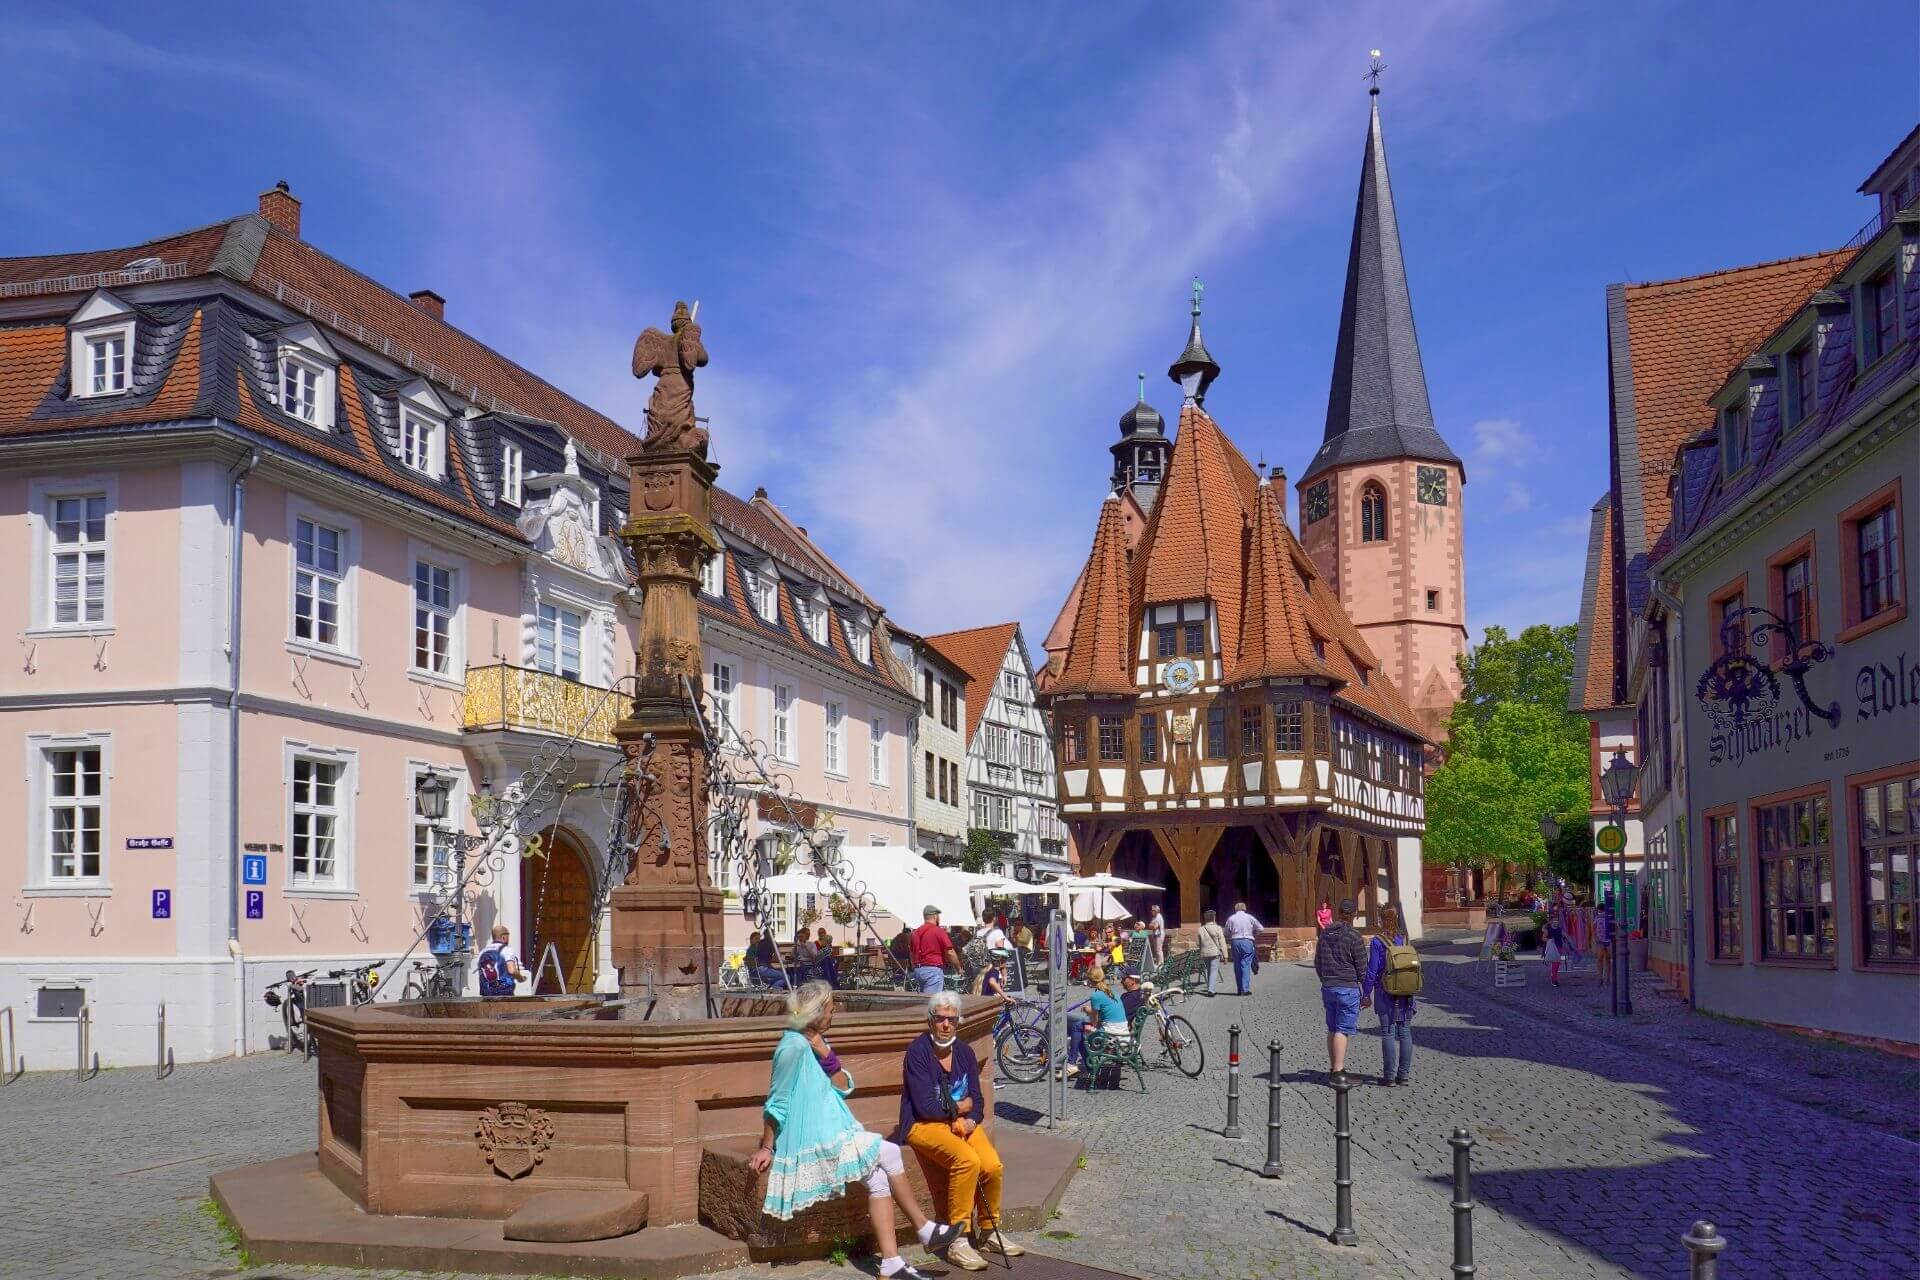 Michelstadt, a Hidden Gem in Germany's Odenwald - My Magic Earth